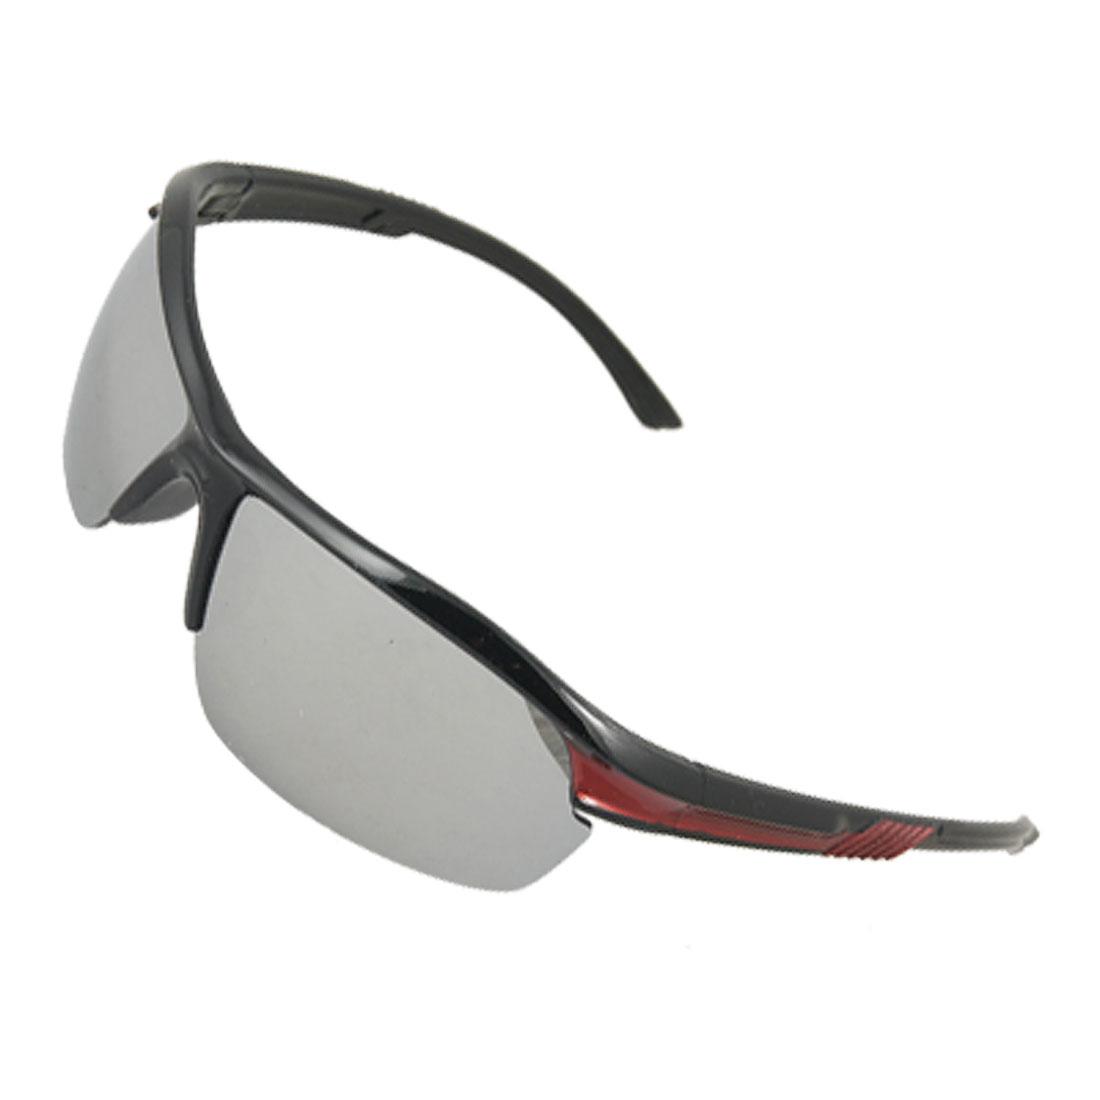 Unisex Mirror Lens Design Black Red Plastic Arms Sports Sunglasses